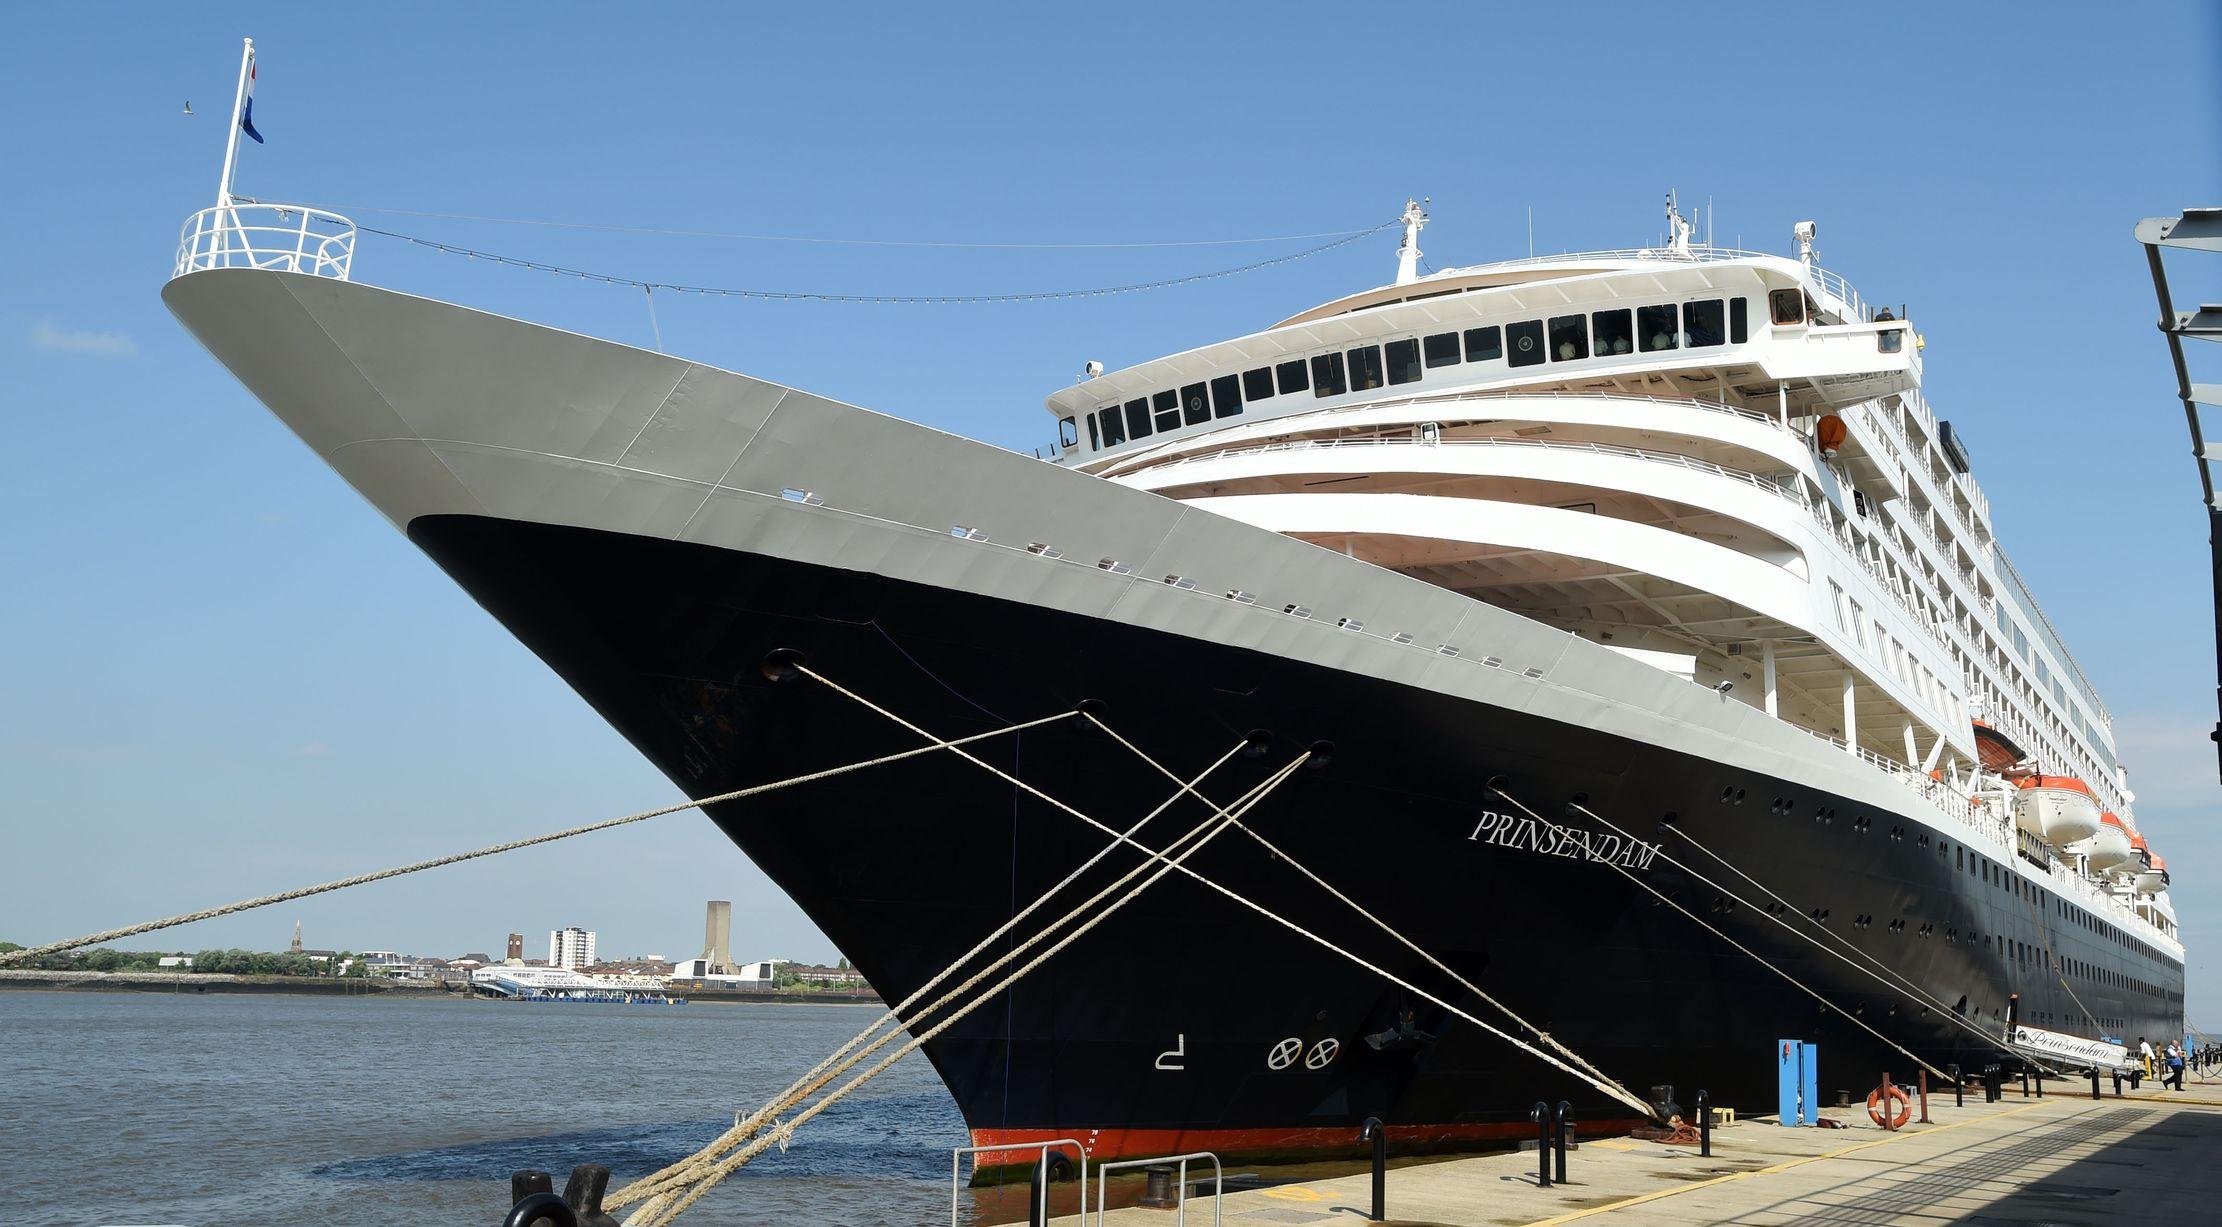 Crucero Prinsedam de Holland America Line